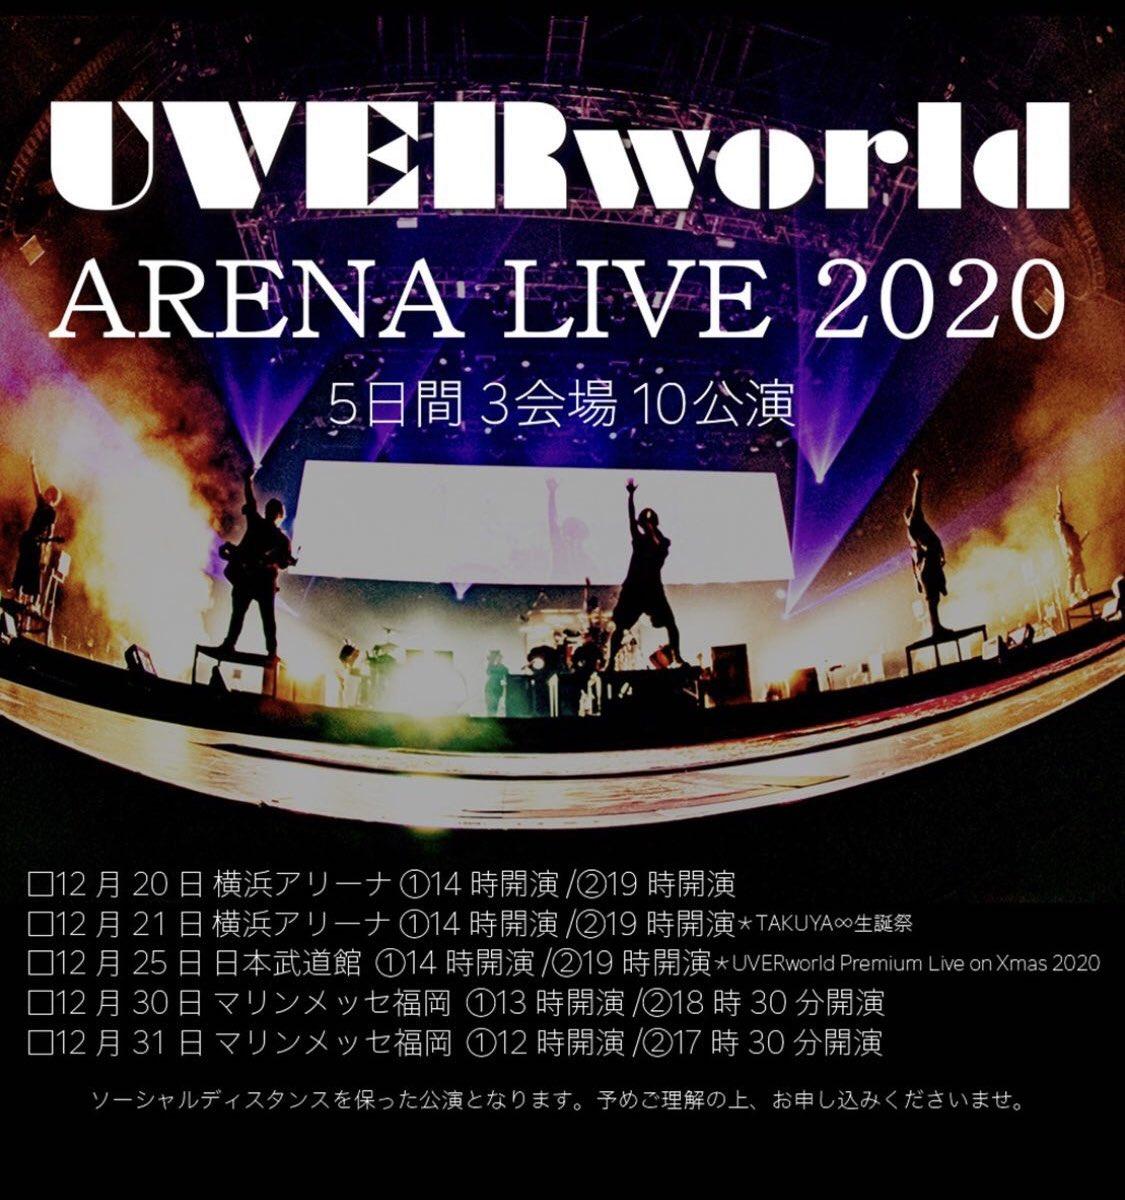 UVERworld ARENA LIVE 2020決定